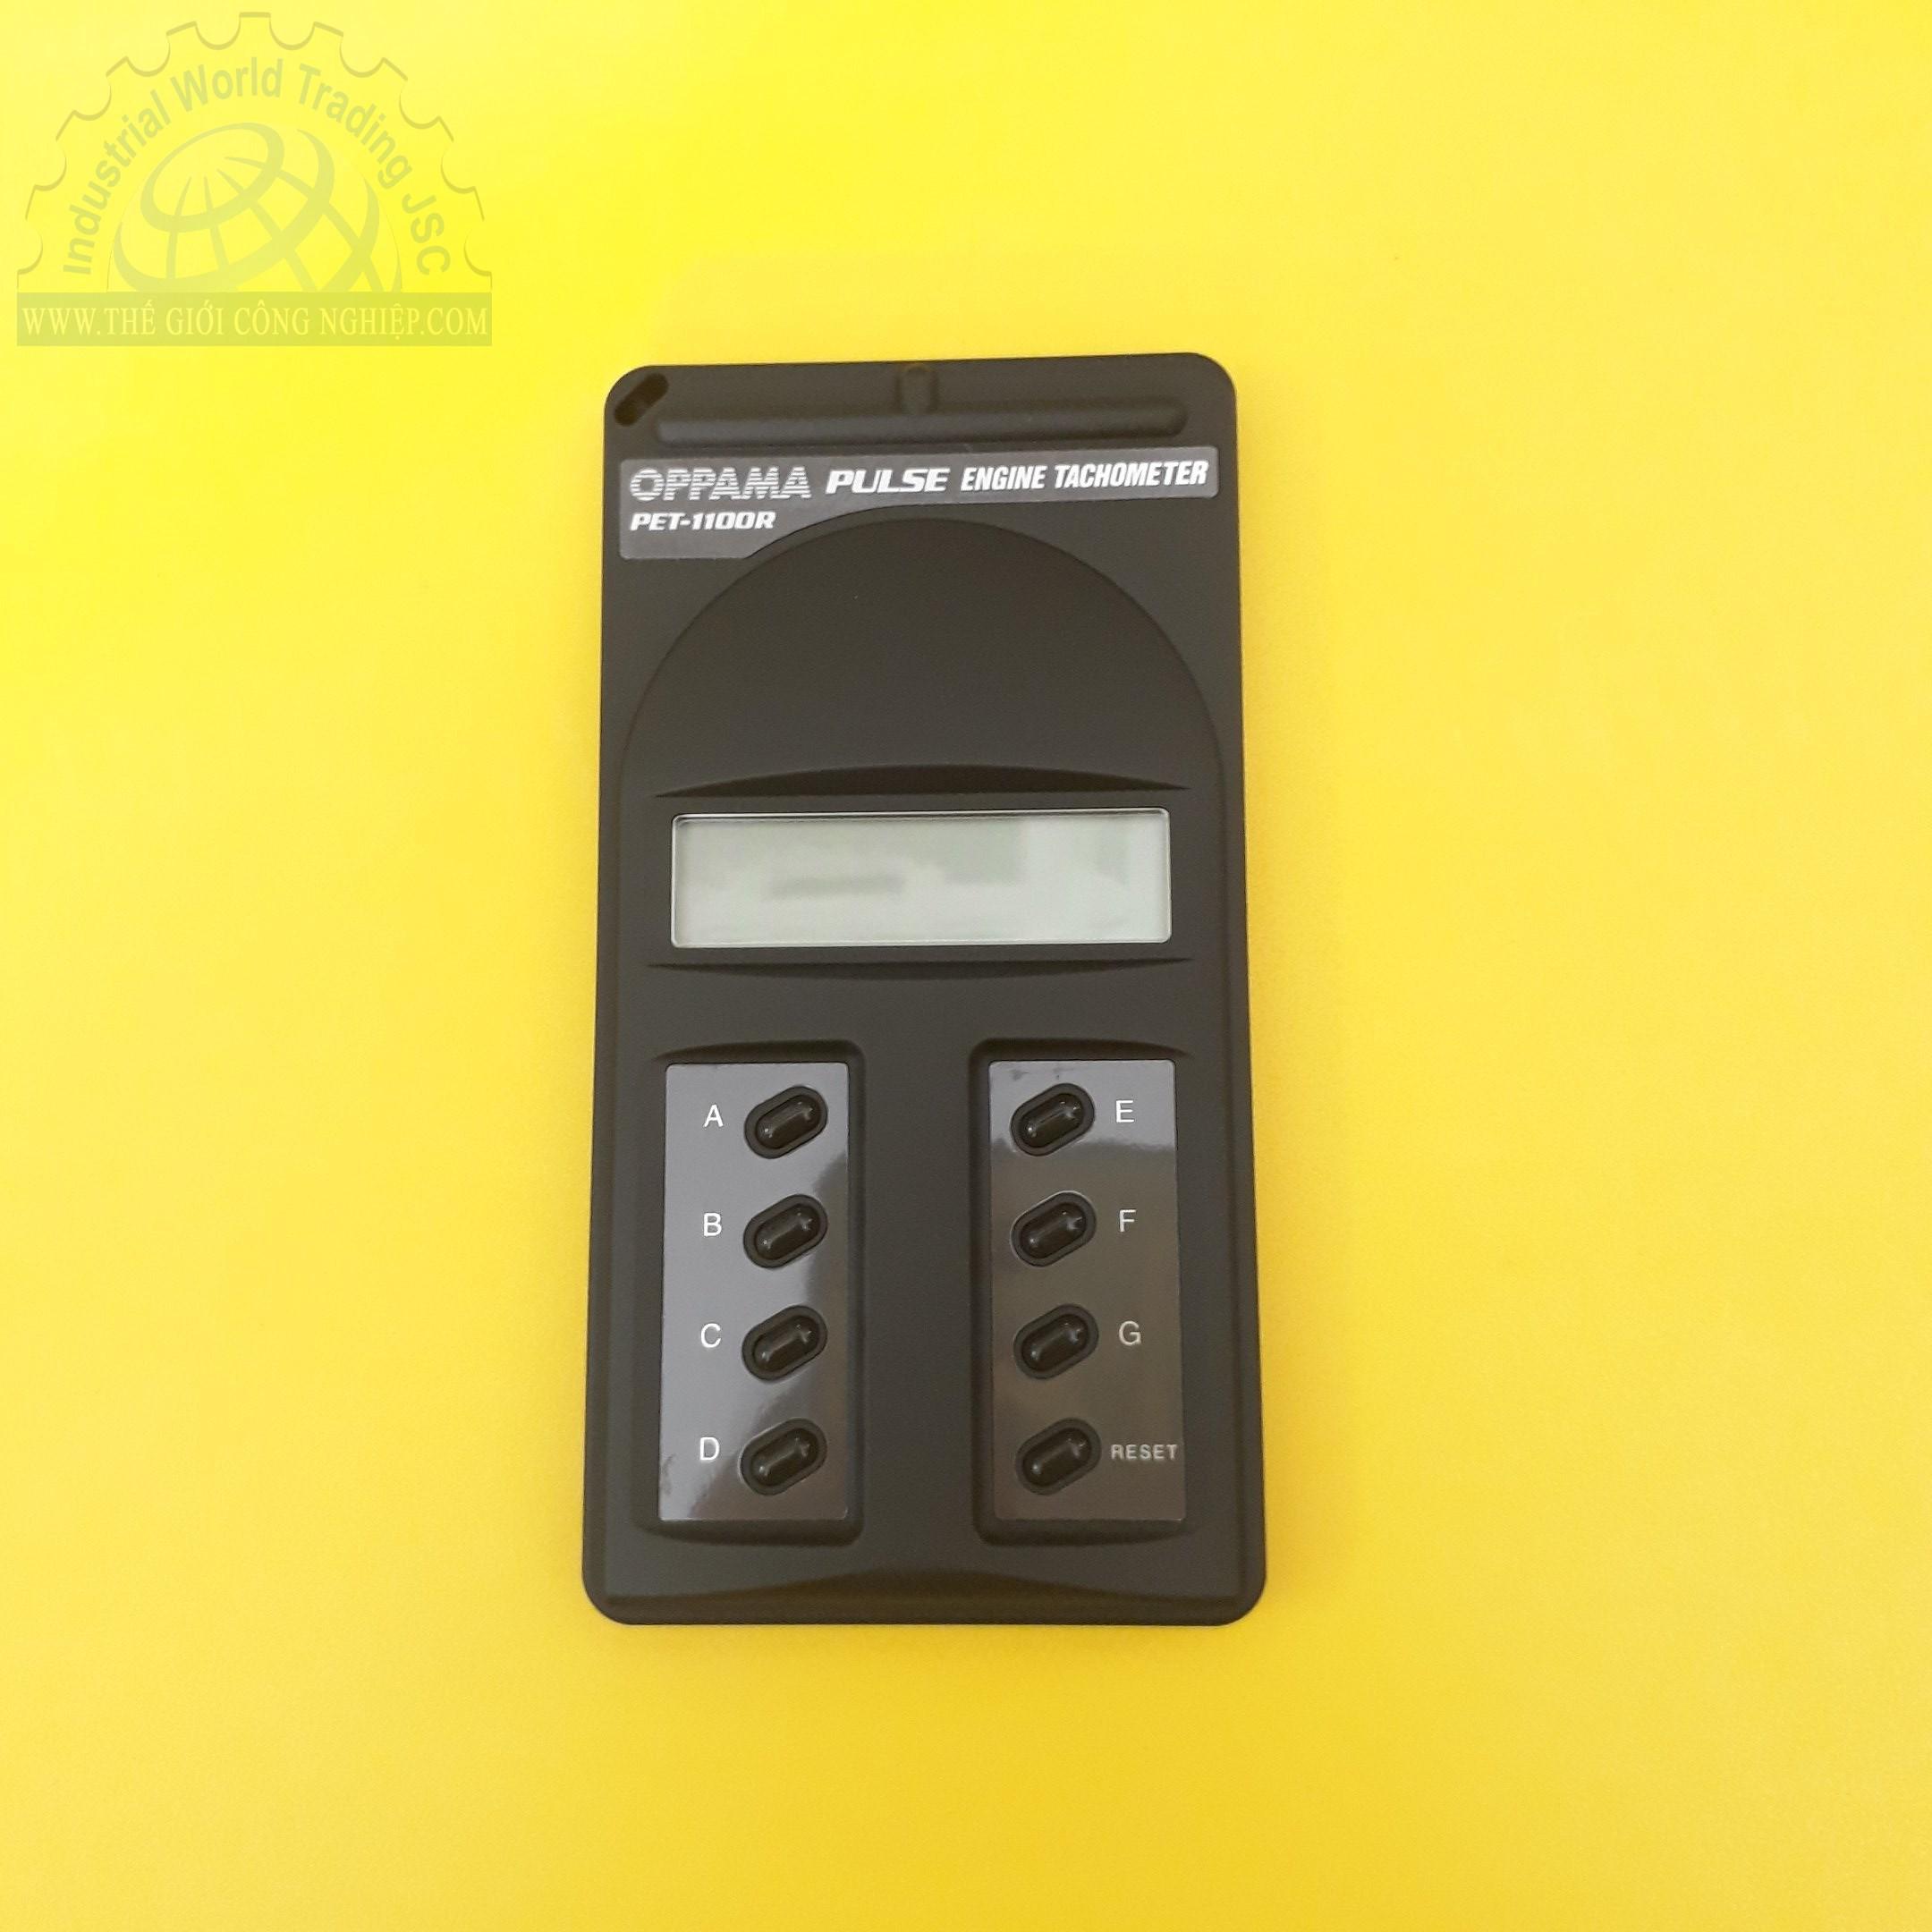 Engine Tachometer, PET-1100R, Oppama PET-1100R Oppama